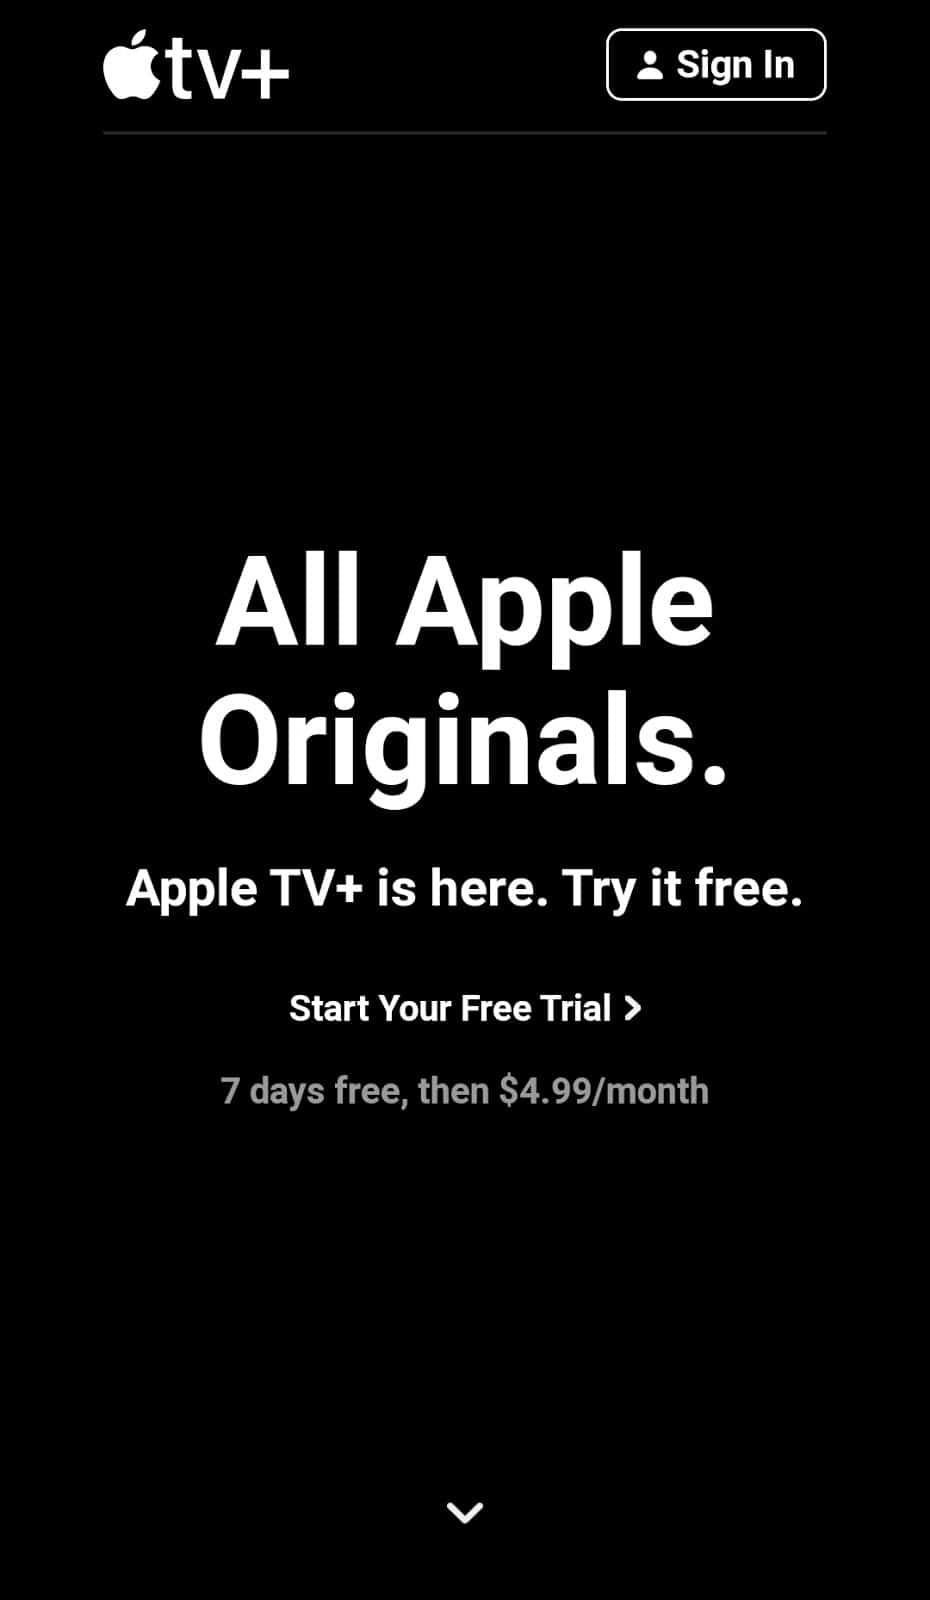 apple mobile landing page